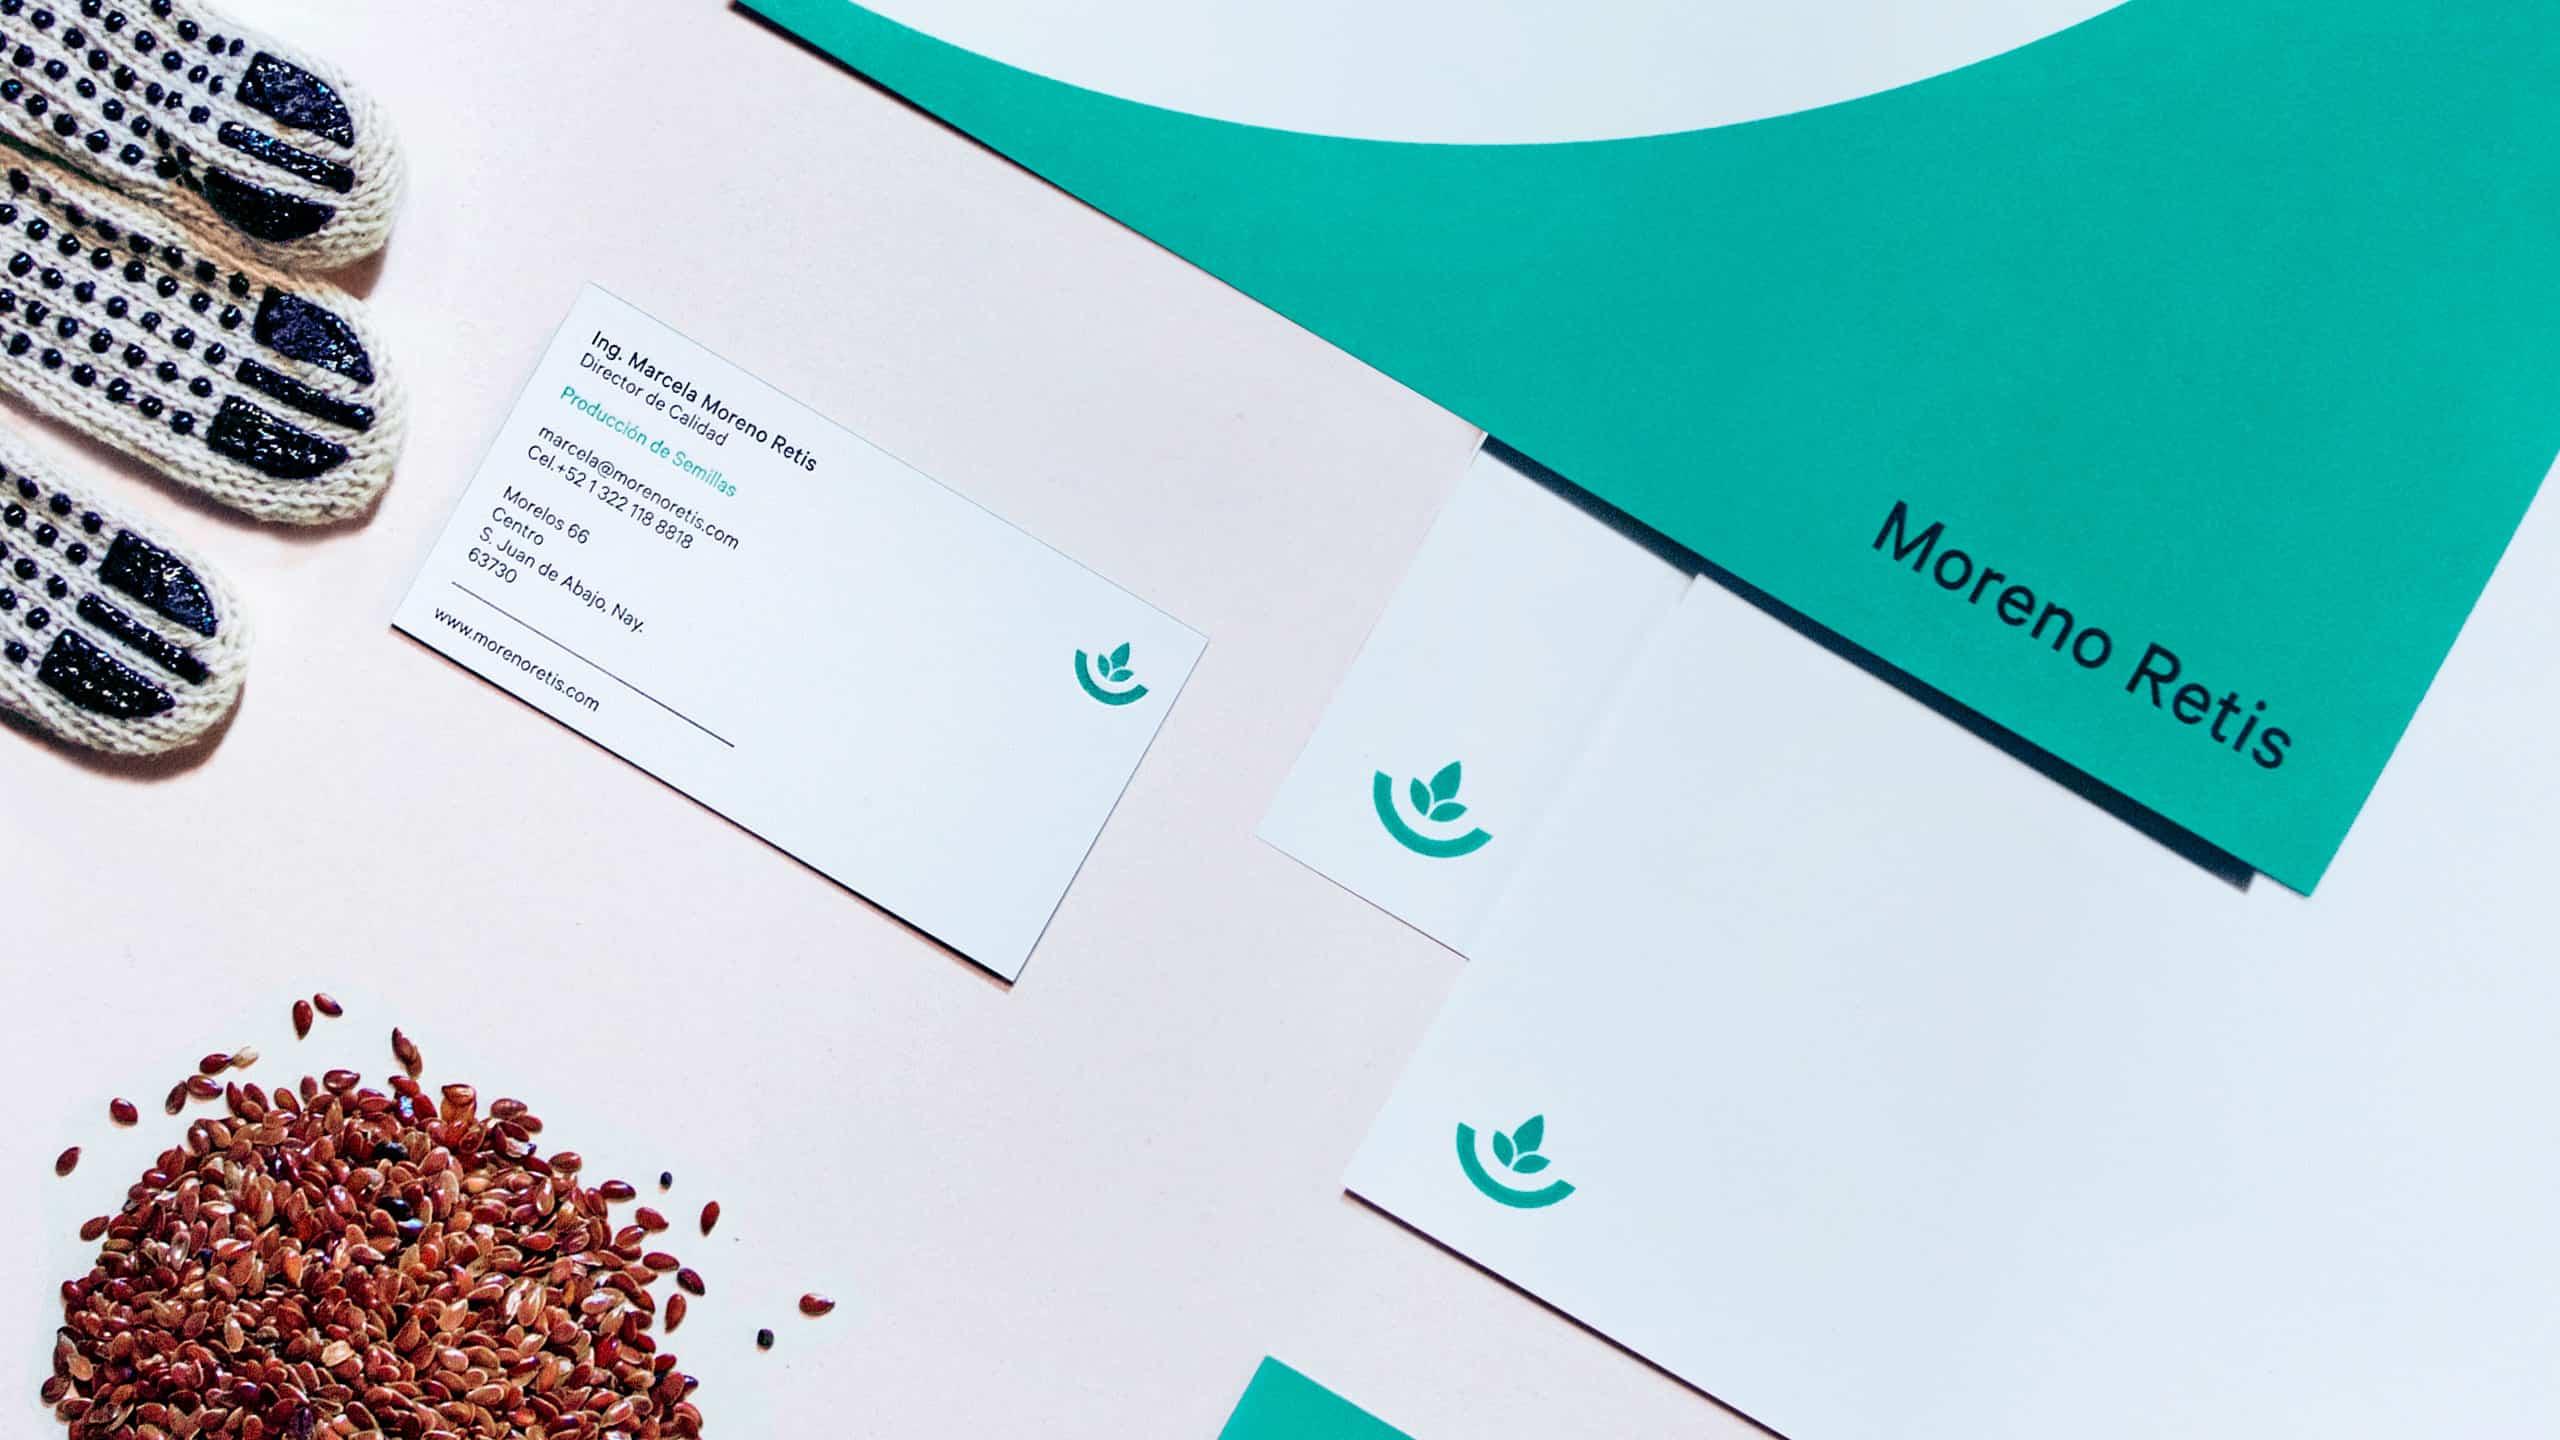 Corporate Branding for Moreno Retis